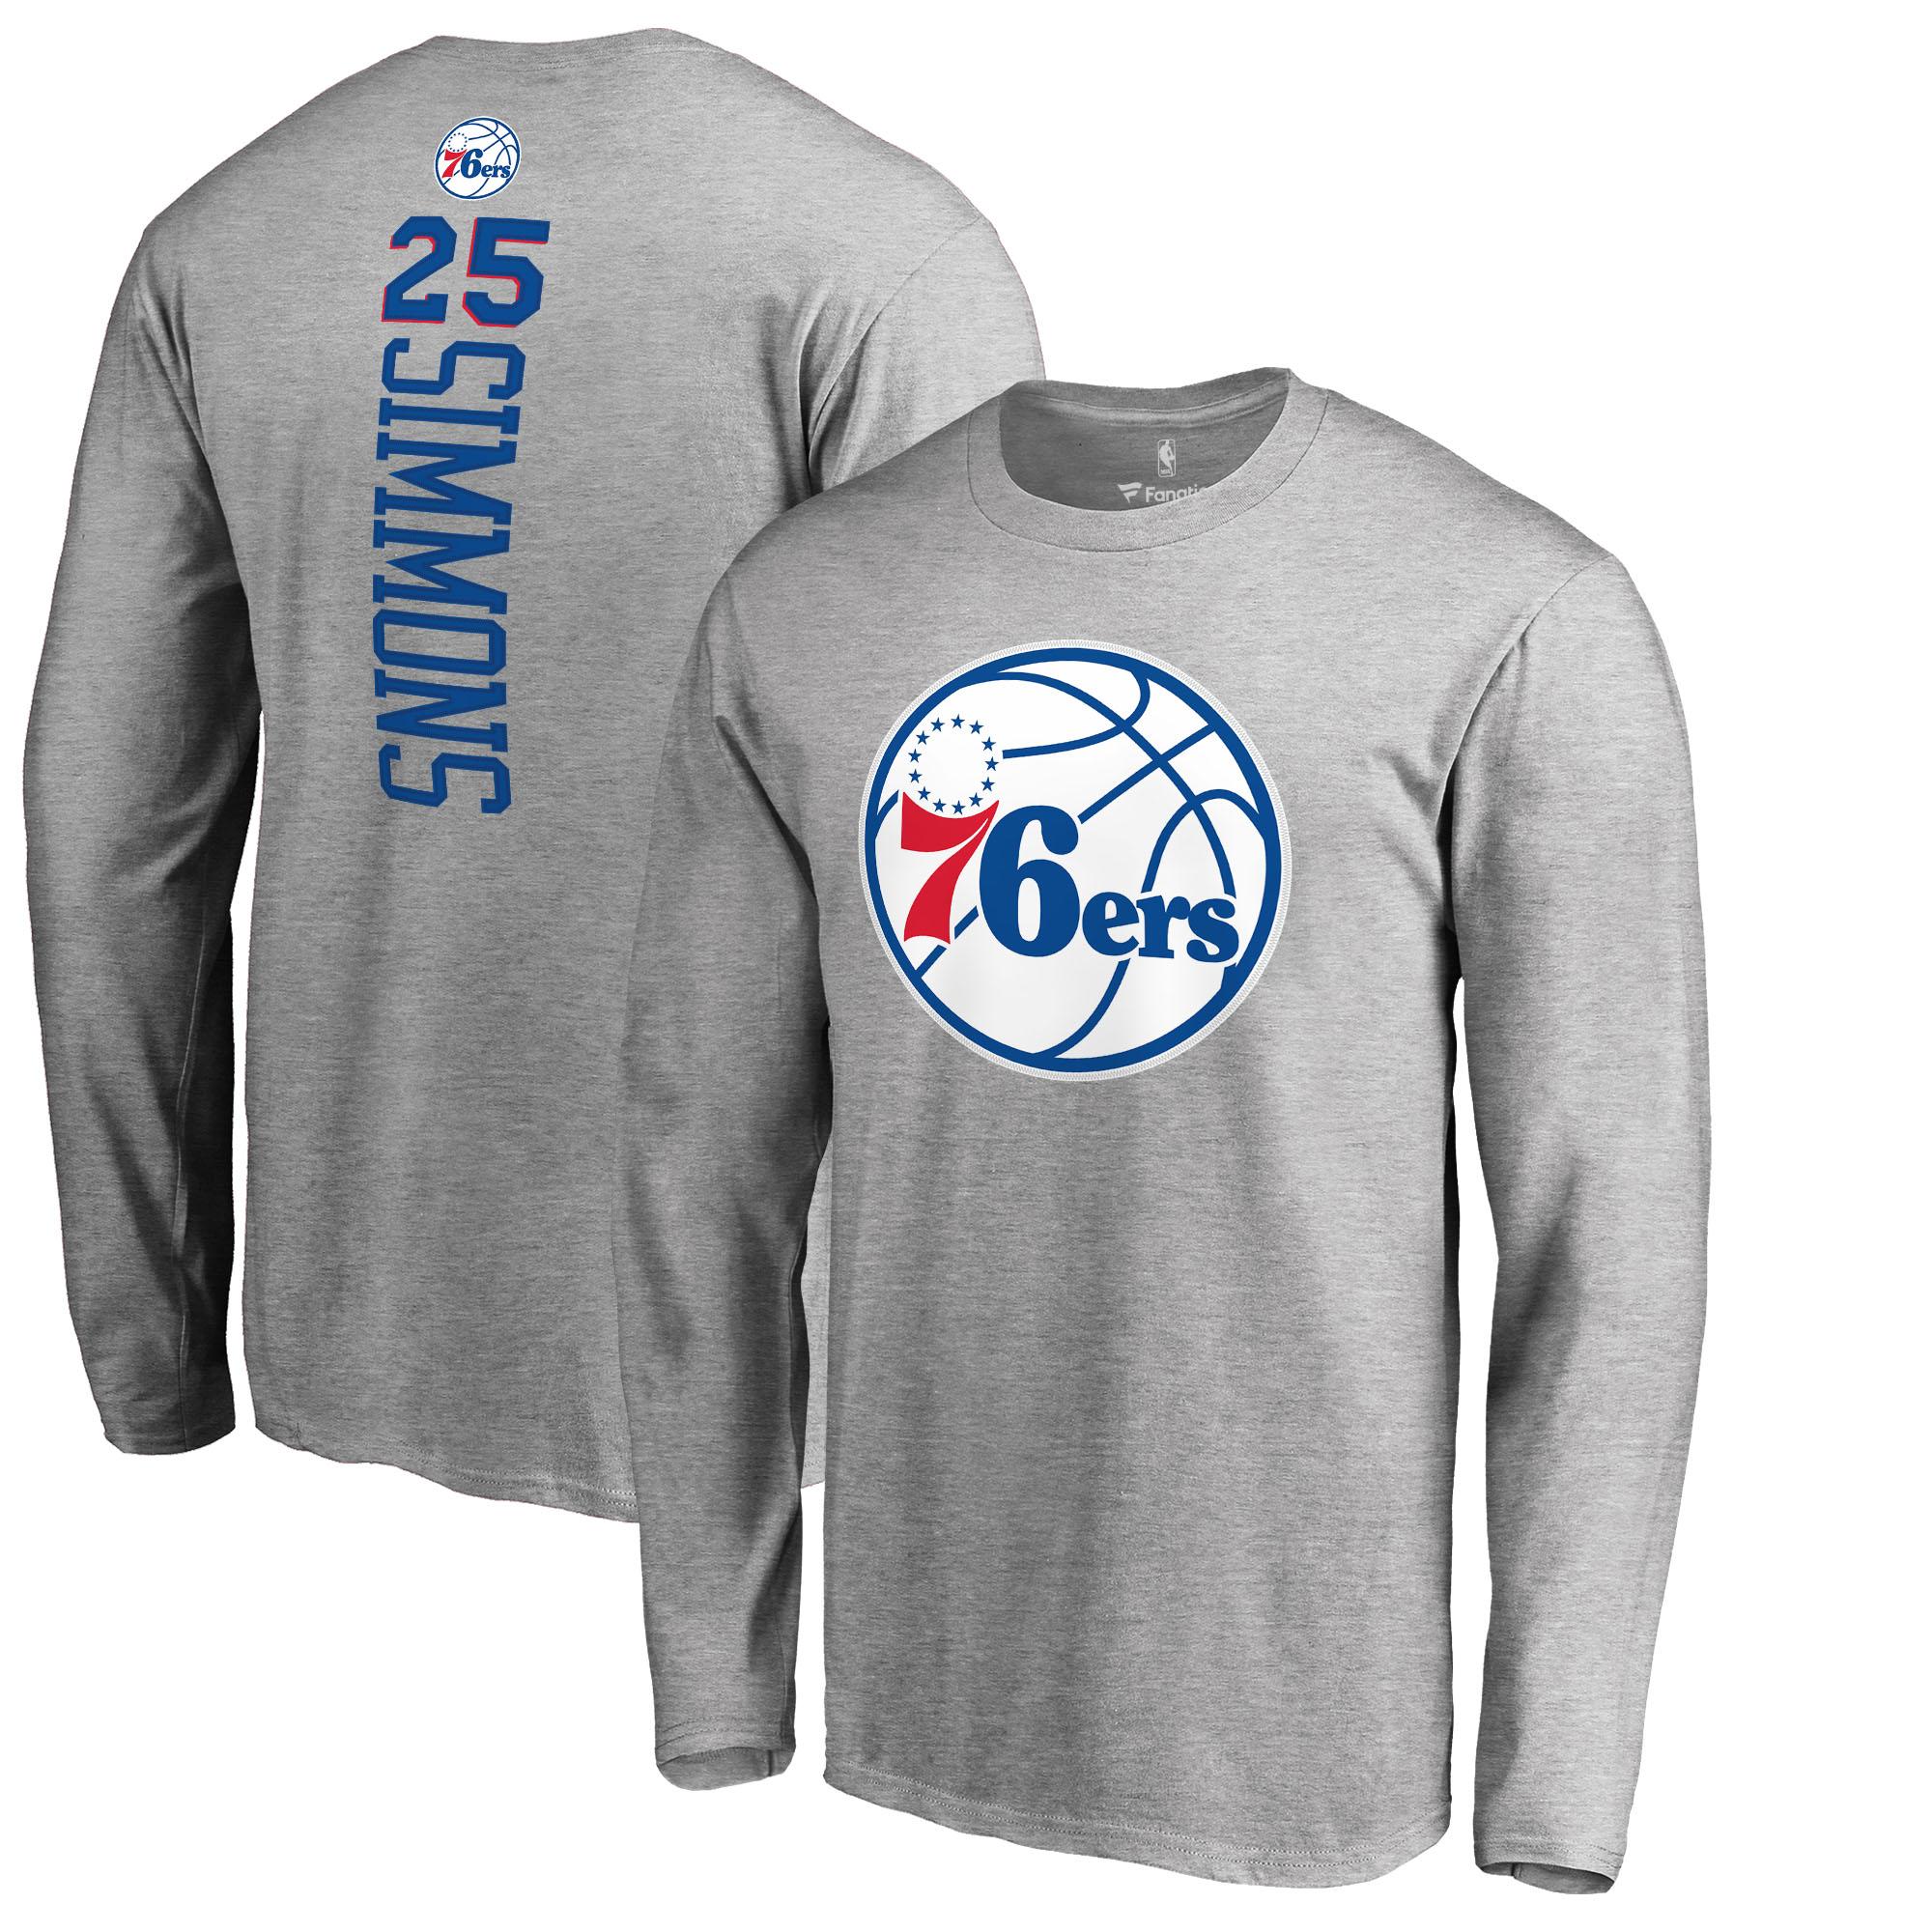 Ben Simmons Philadelphia 76ers Fanatics Branded Backer Big & Tall Long Sleeve T-Shirt - Gray